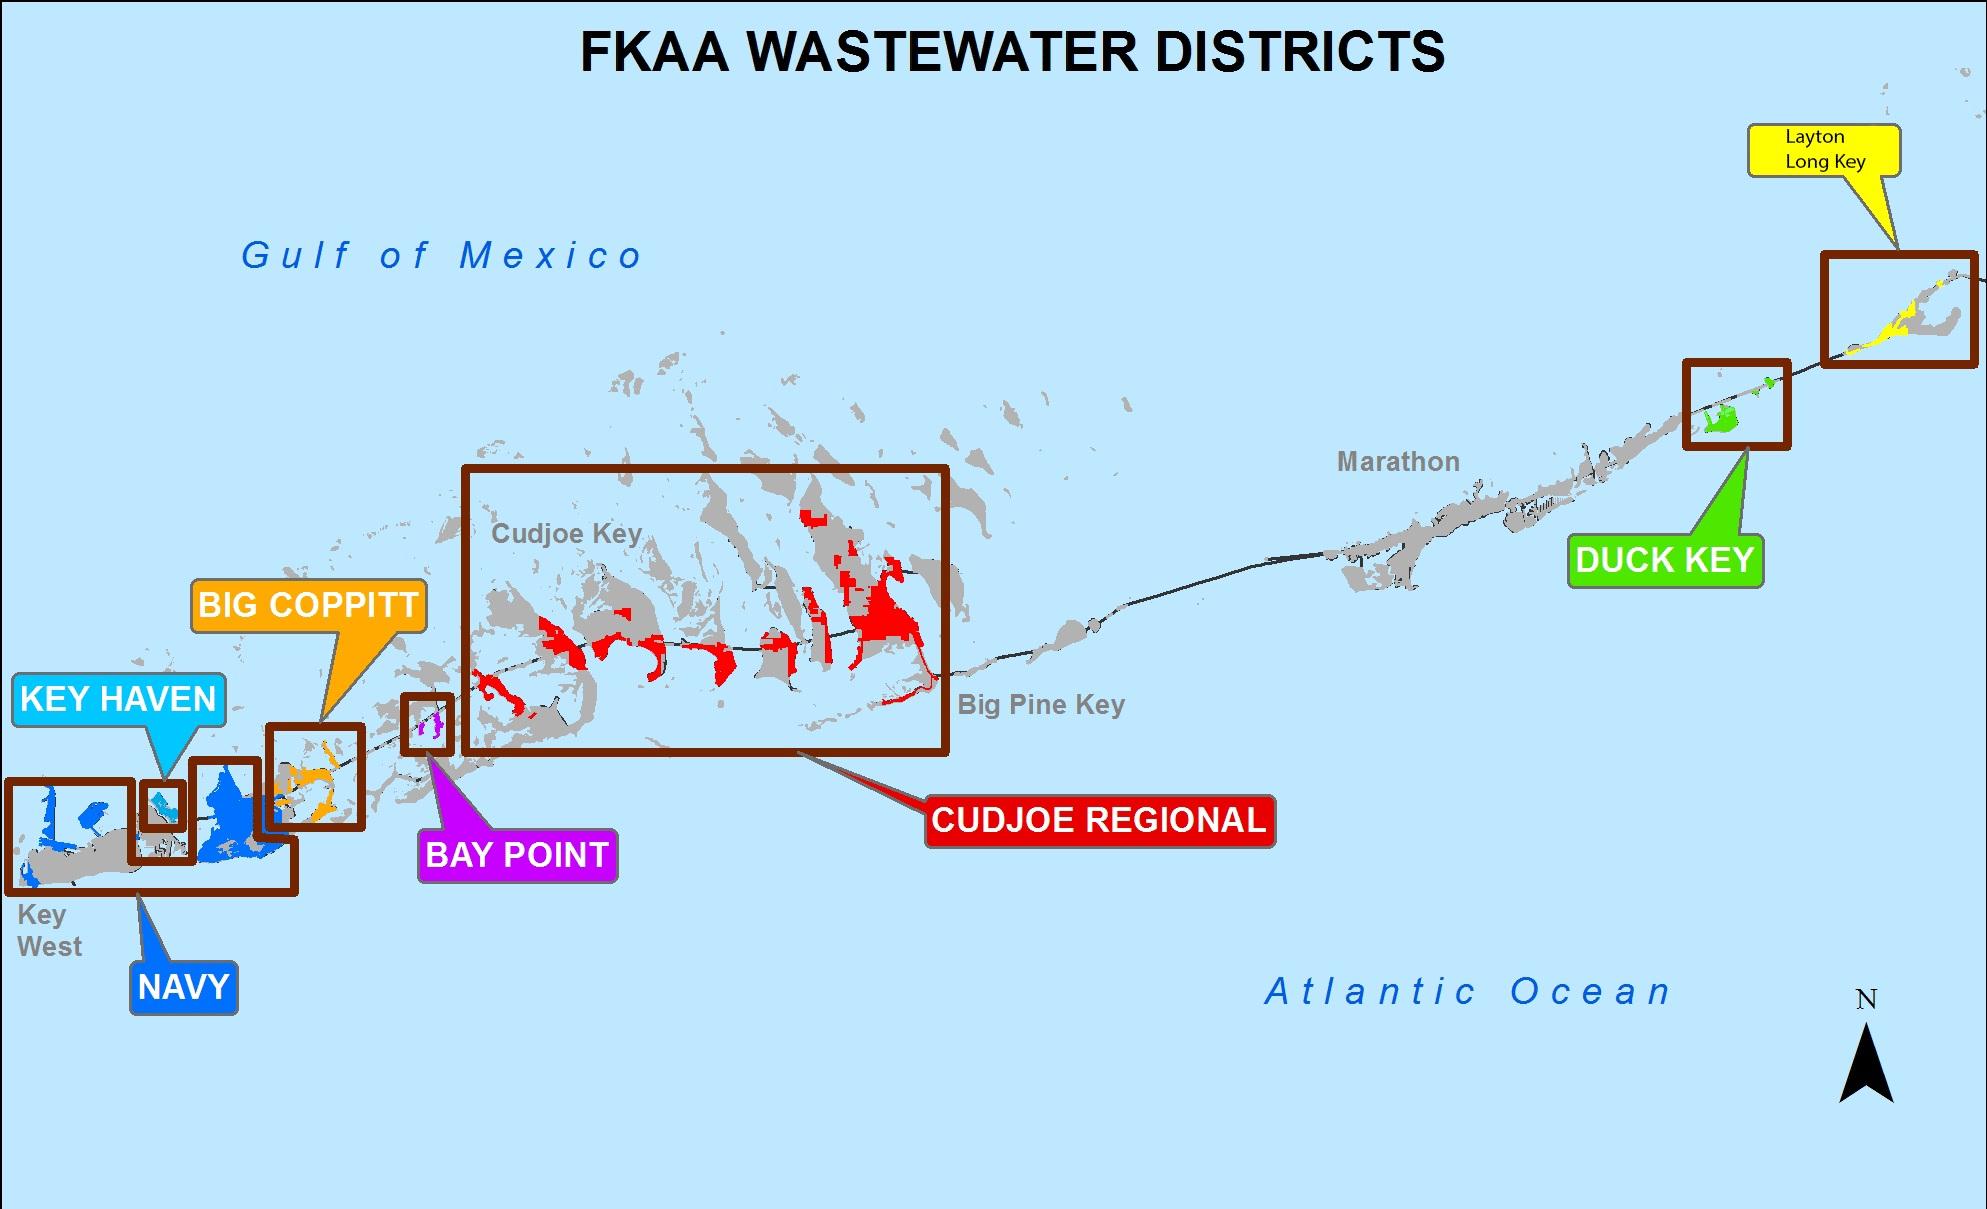 Florida Keys Aqueduct Authority - Florida Keys Map With Mile Markers